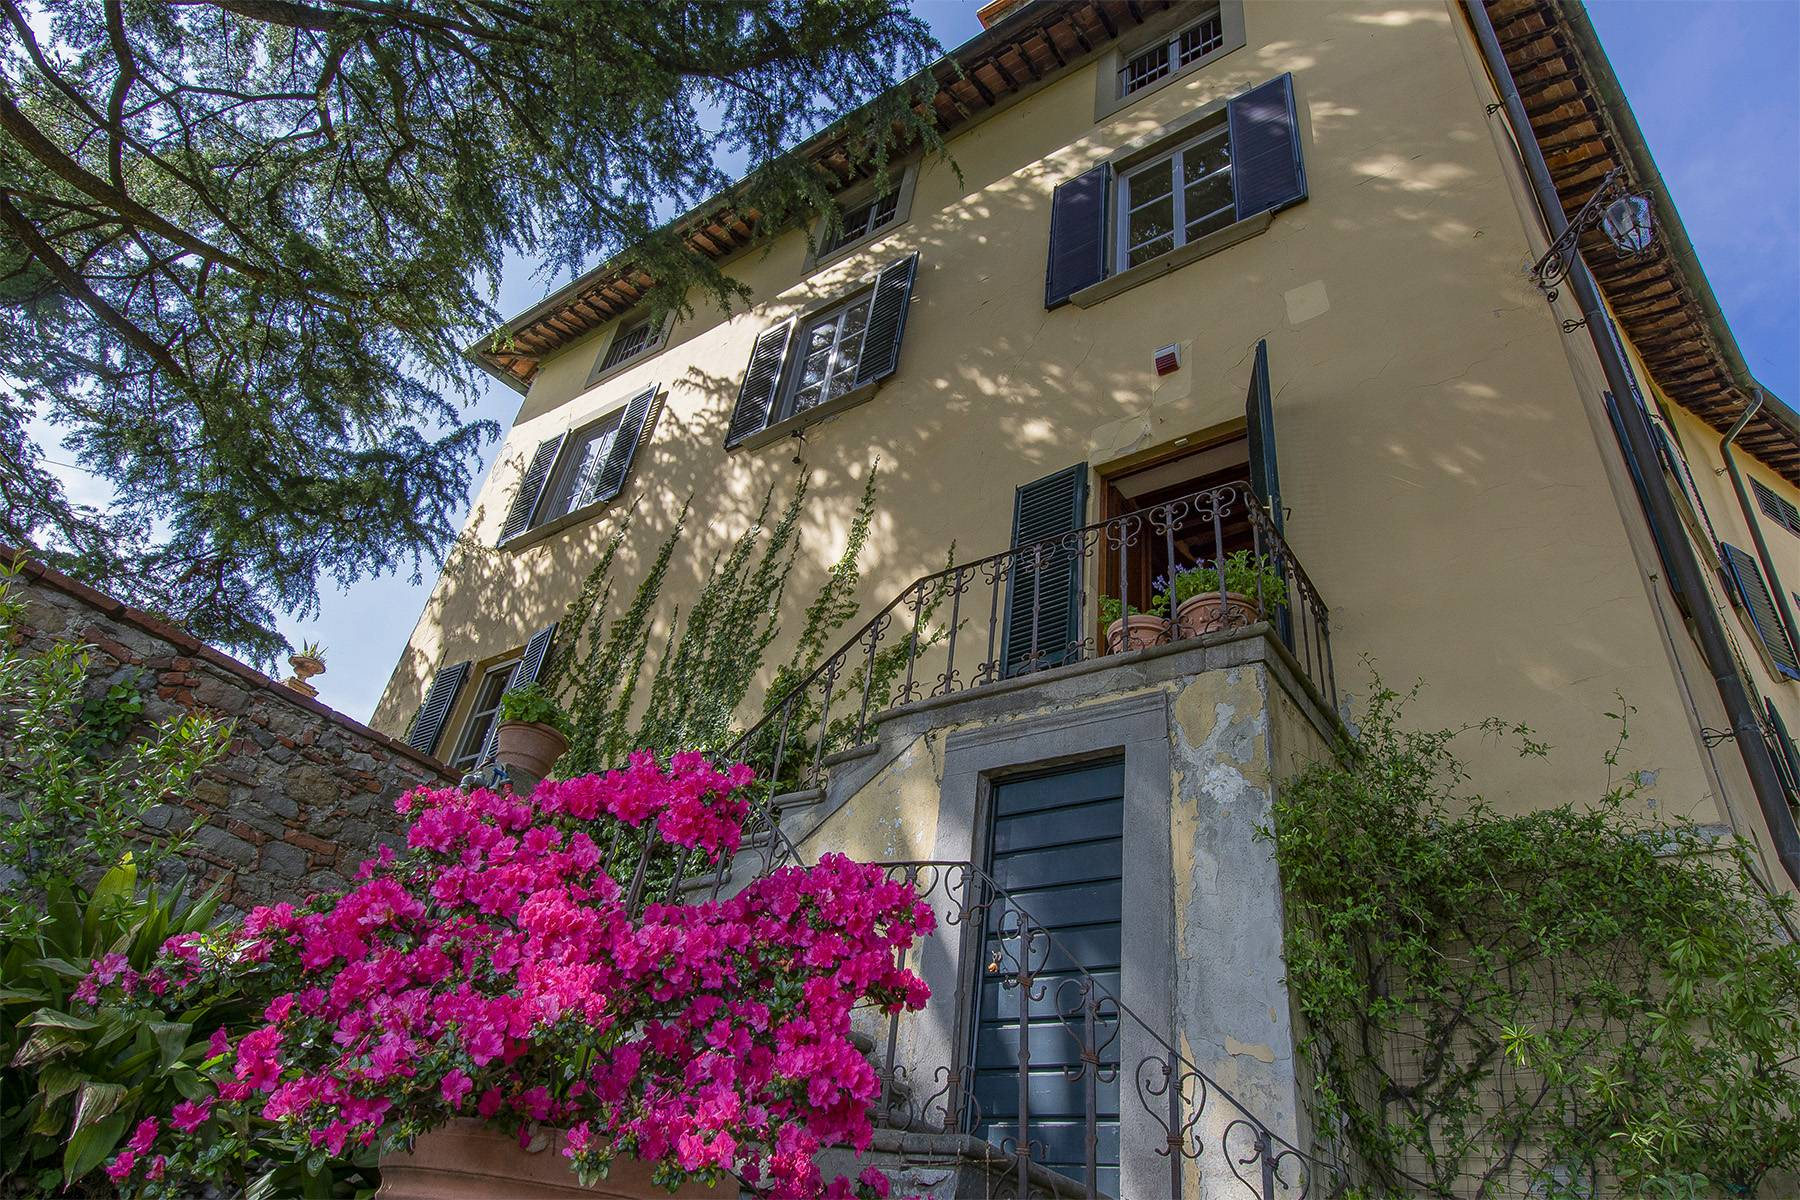 Stunning country villa nestled on the hills - 3